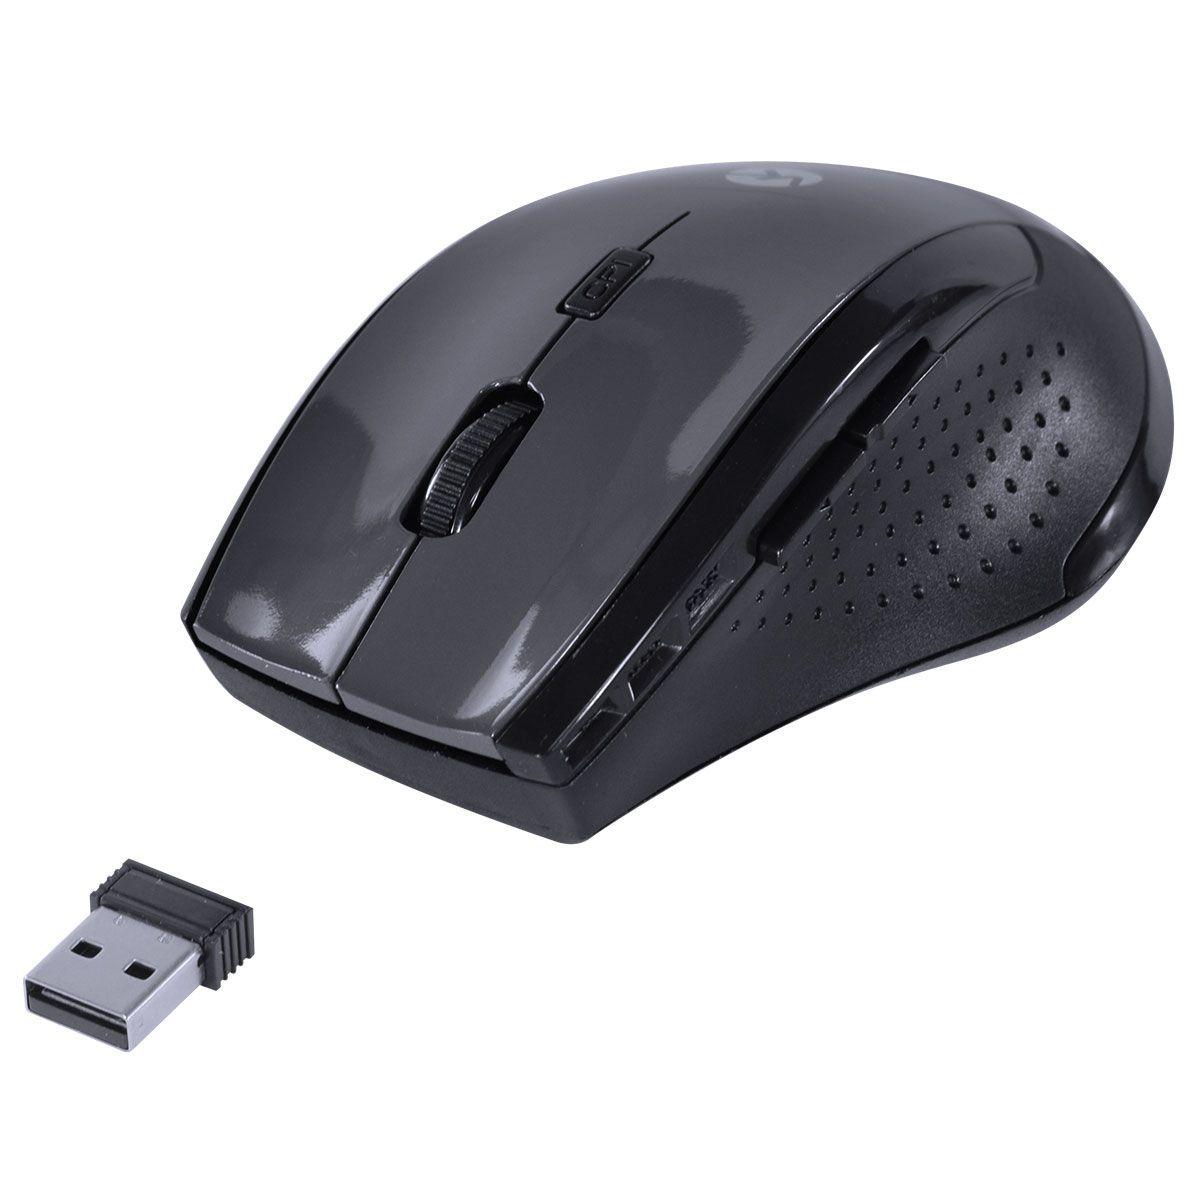 Mouse Sem Fio Híbrido 2.4Ghz + Bluetooth 4.0 1200 DPI Dynamic Ergo Space Gray USB DM122 28421 - Vinik